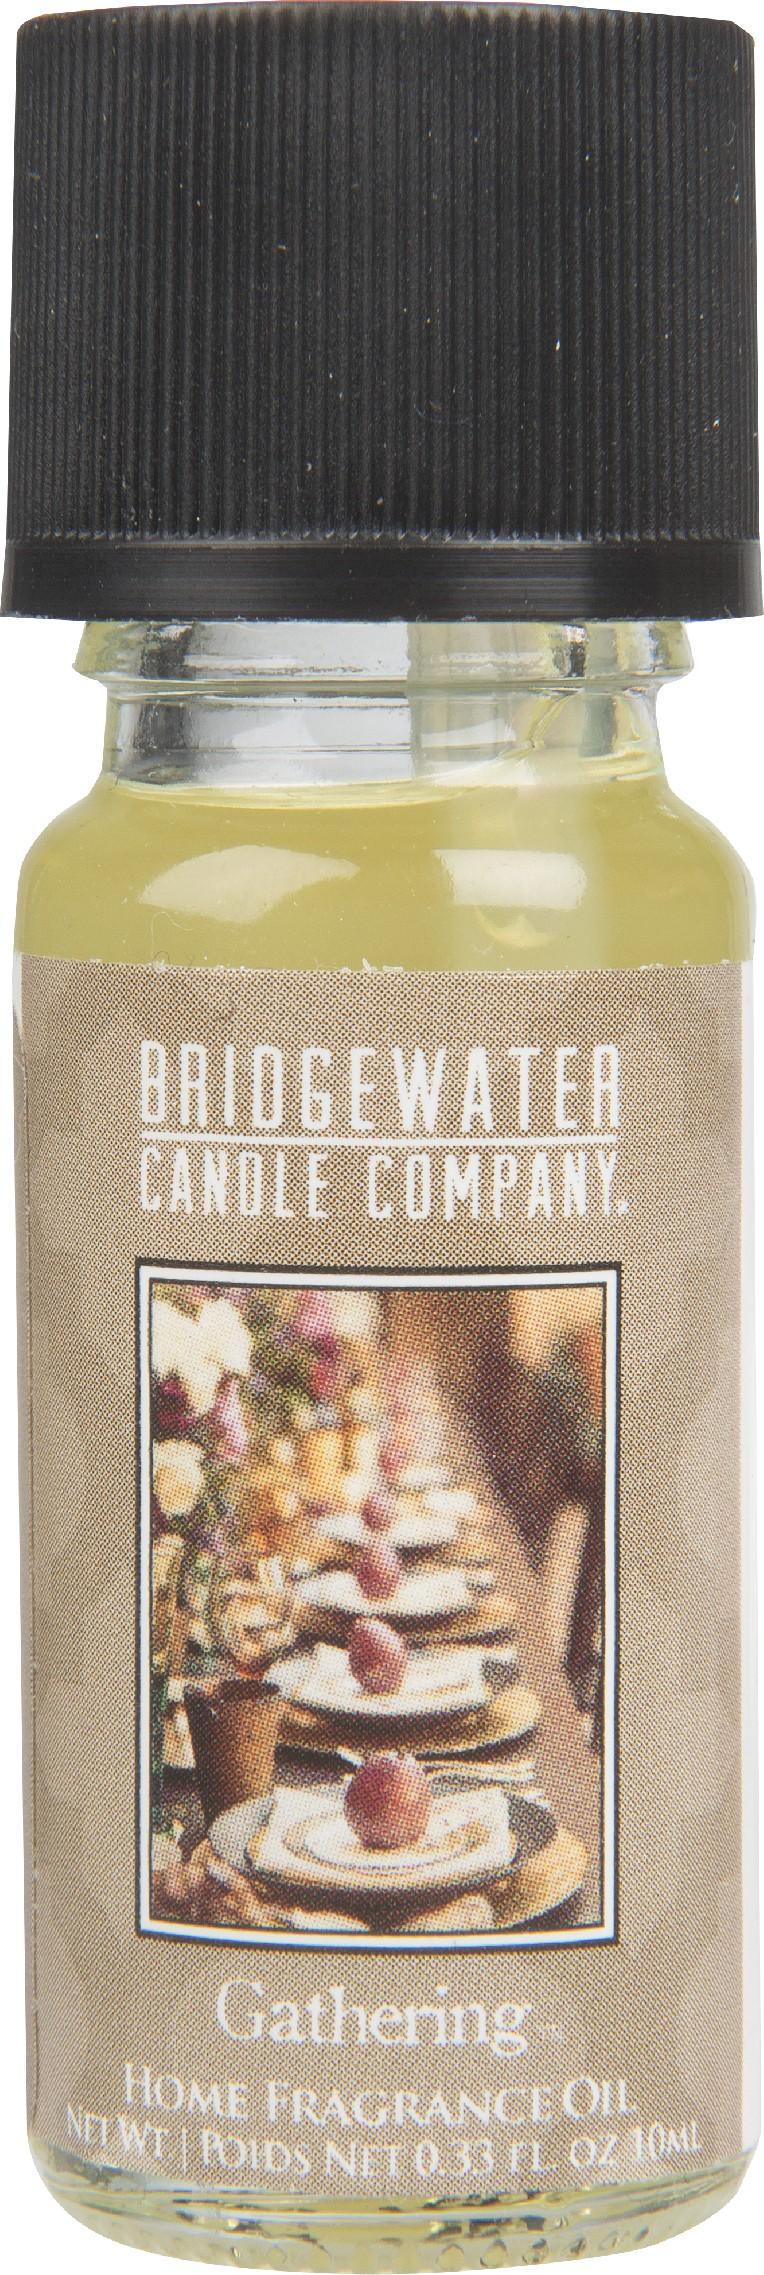 Bridgewater Candle Company Vonný olej Gathering